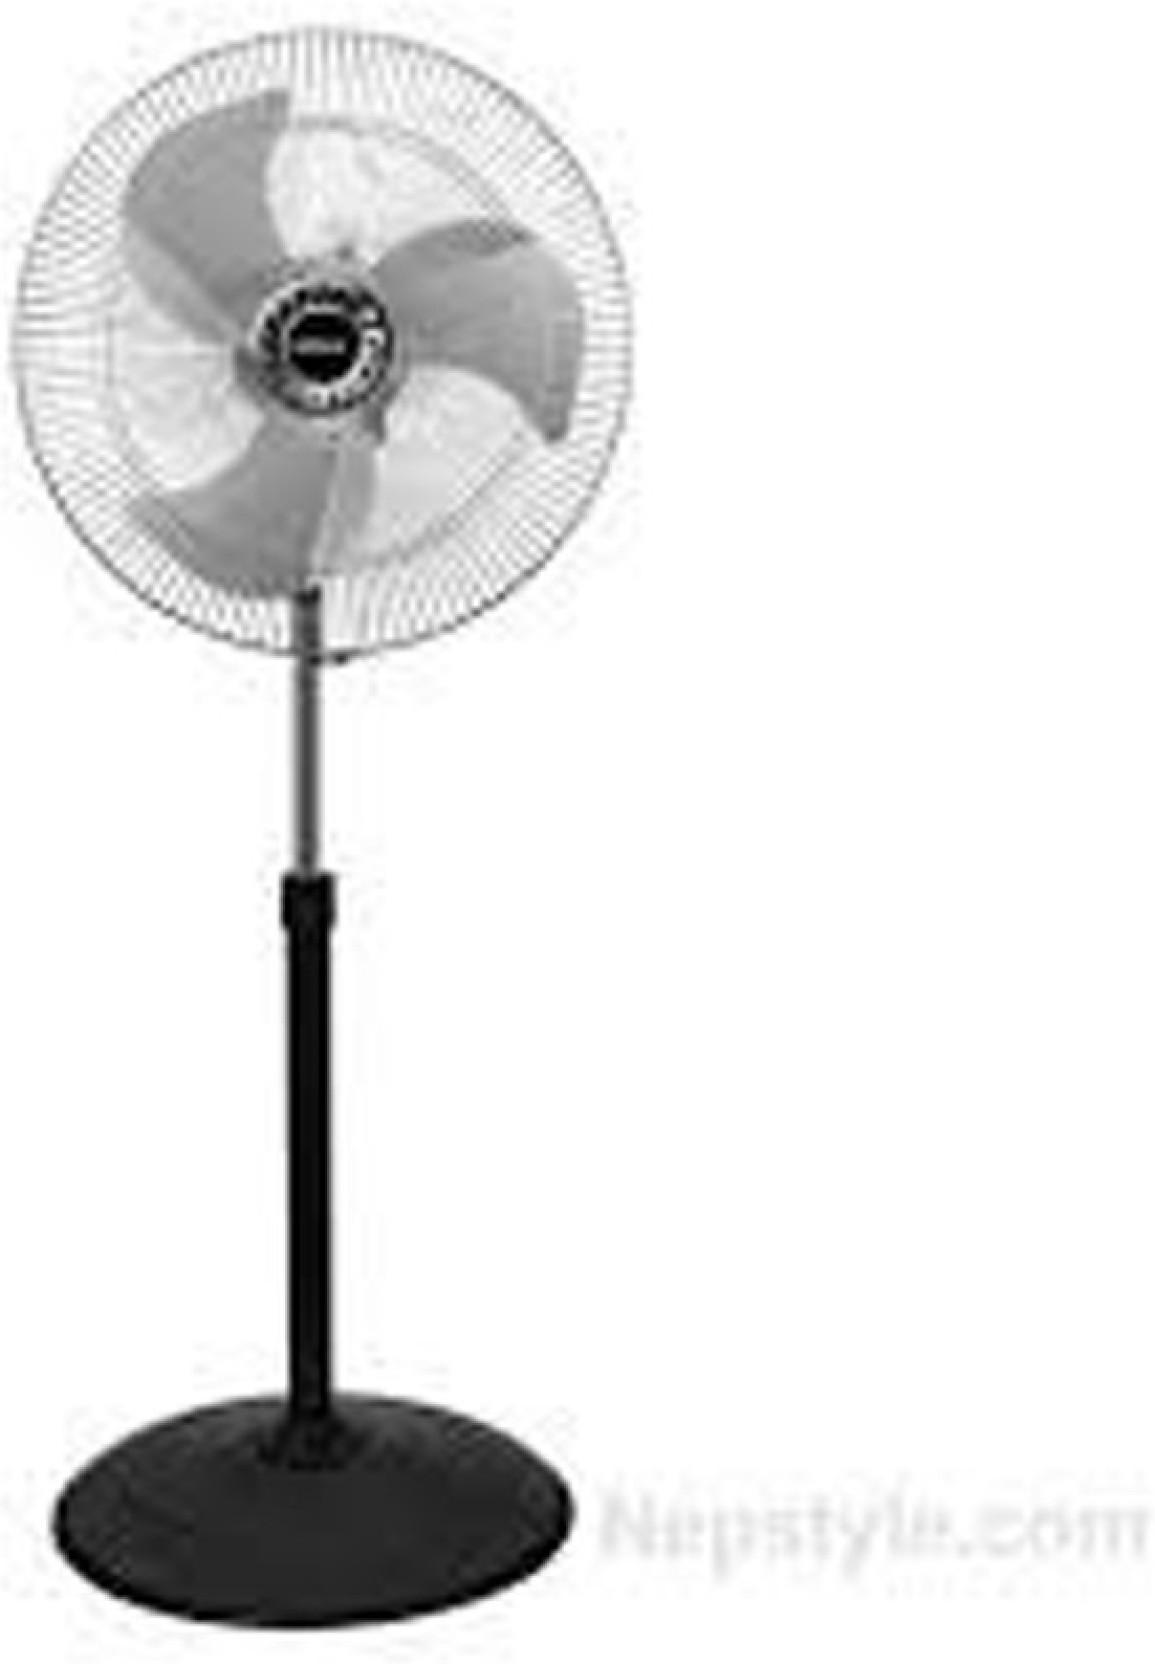 Crompton Storm 2, 450MM 3 Blade Pedestal Fan Price in India - Buy ... for Crompton Pedestal Fan  585eri